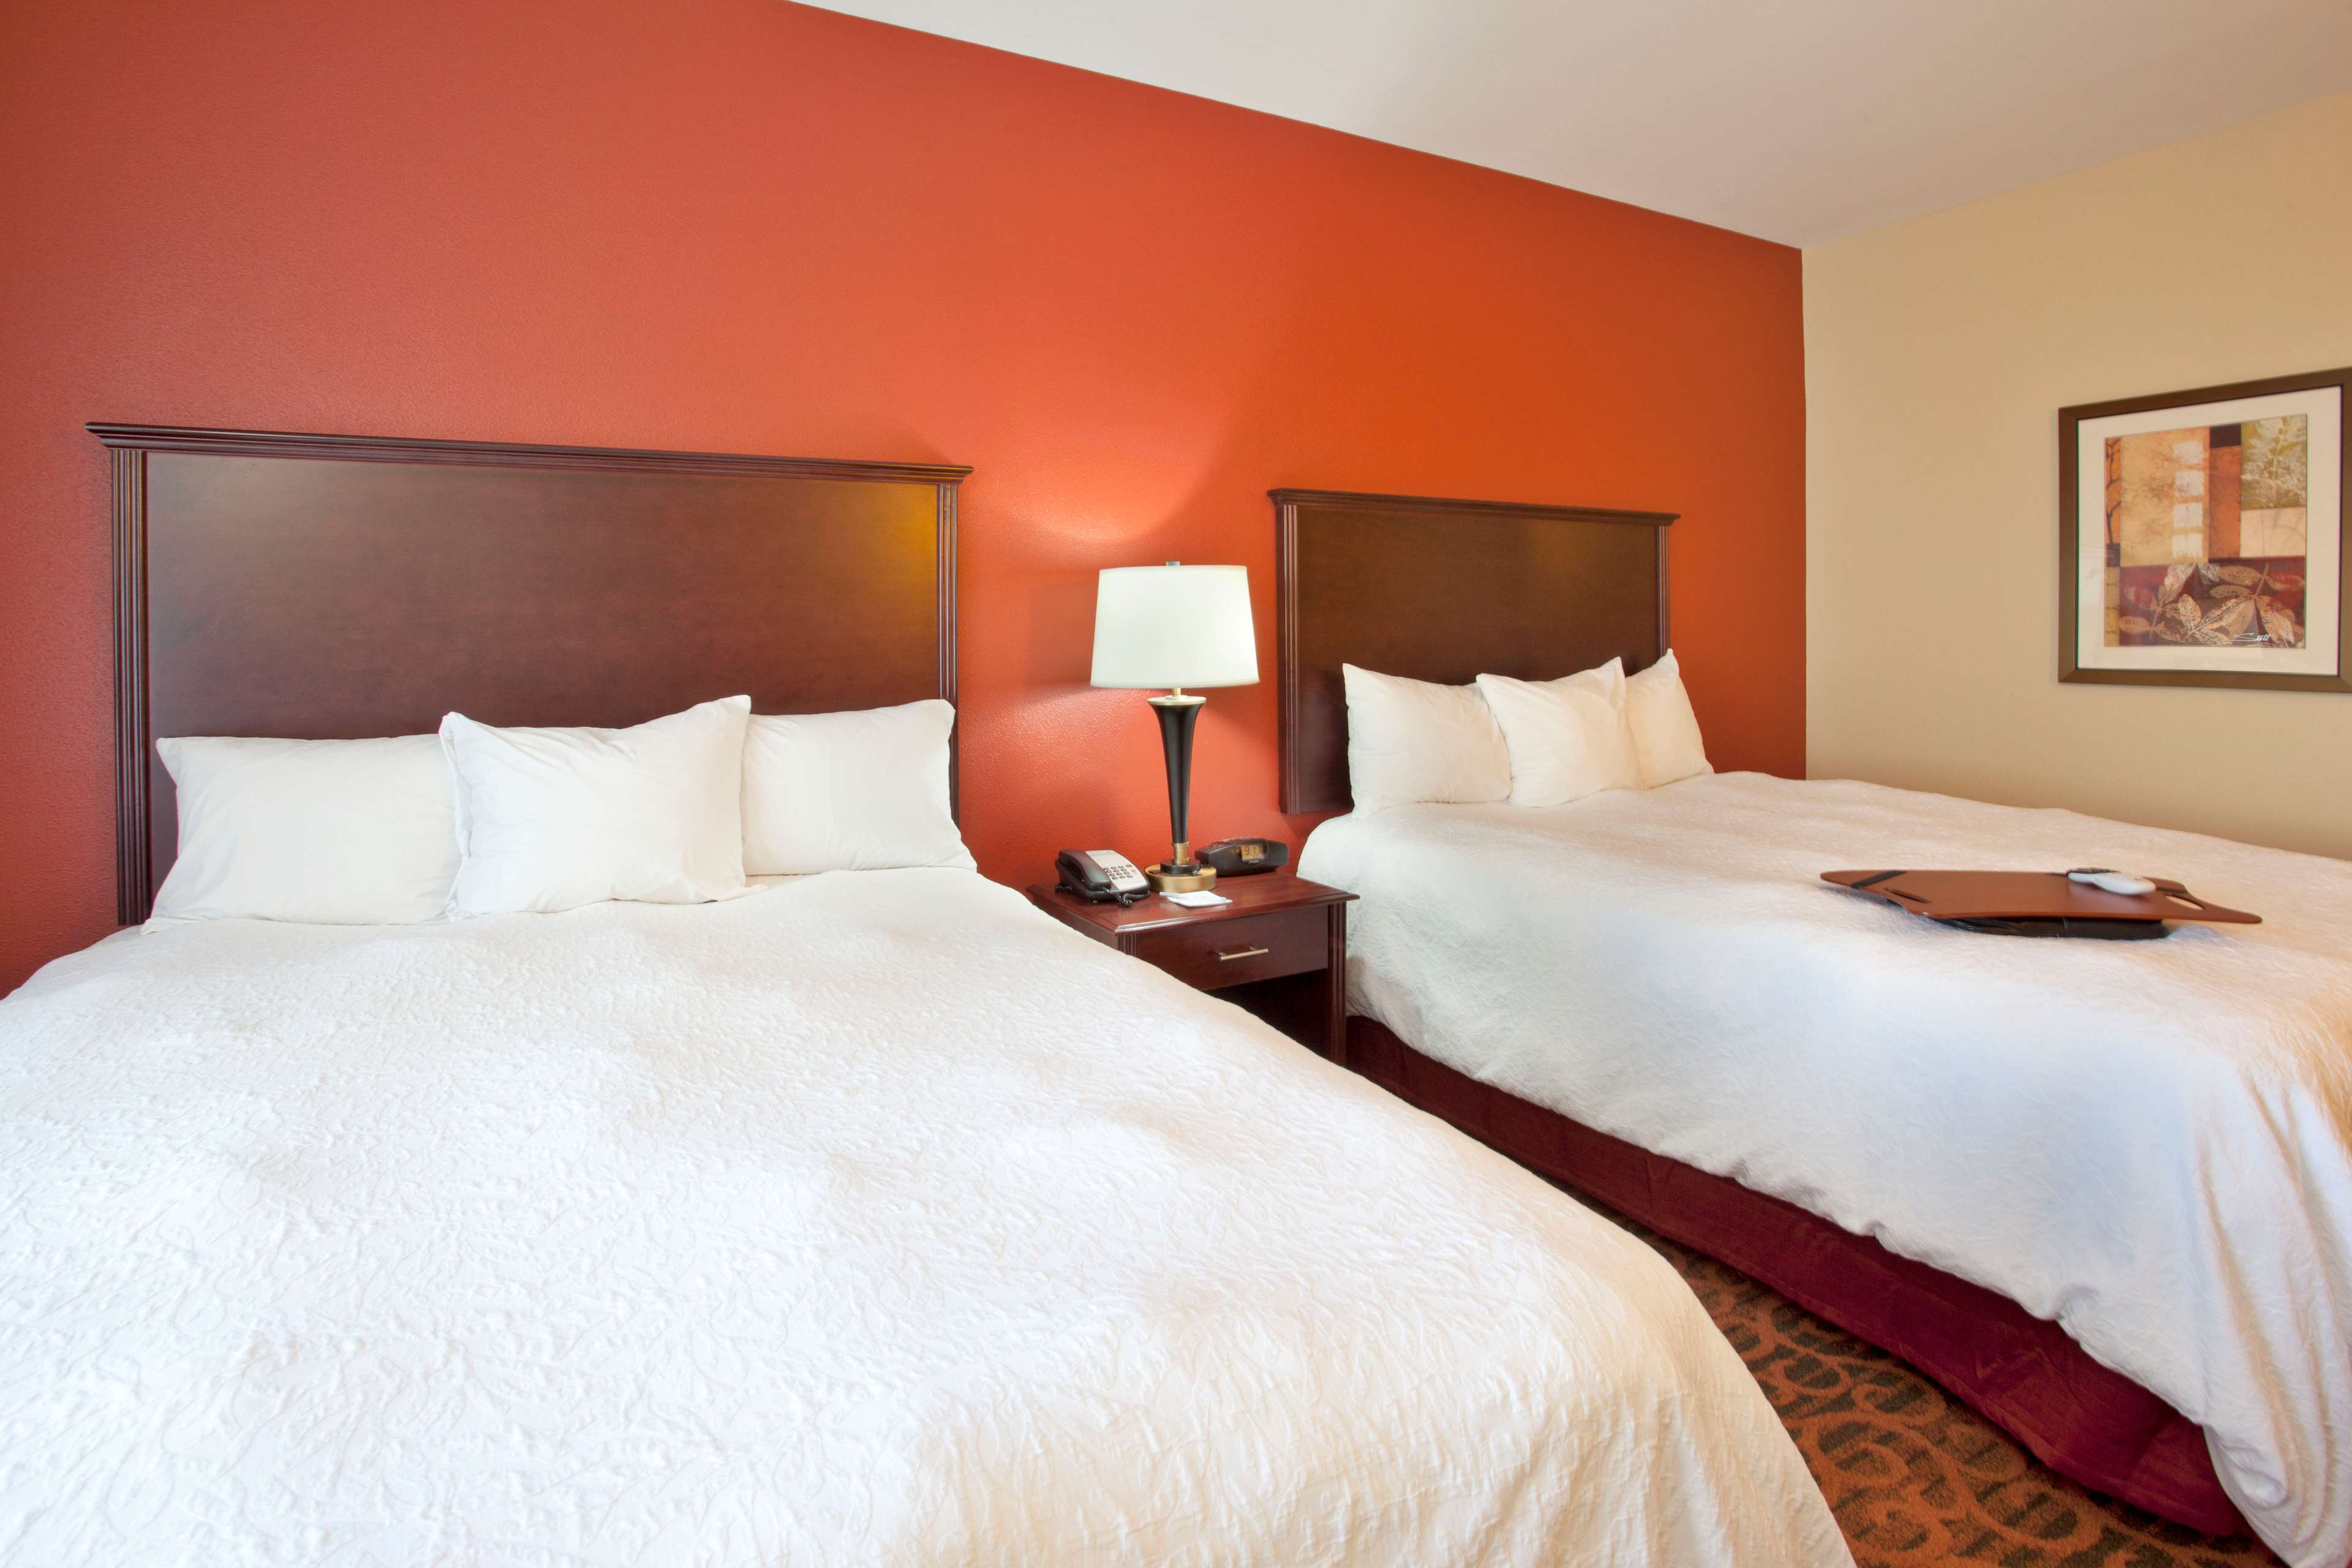 Hampton Inn & Suites Fort Worth-West-I-30 image 22